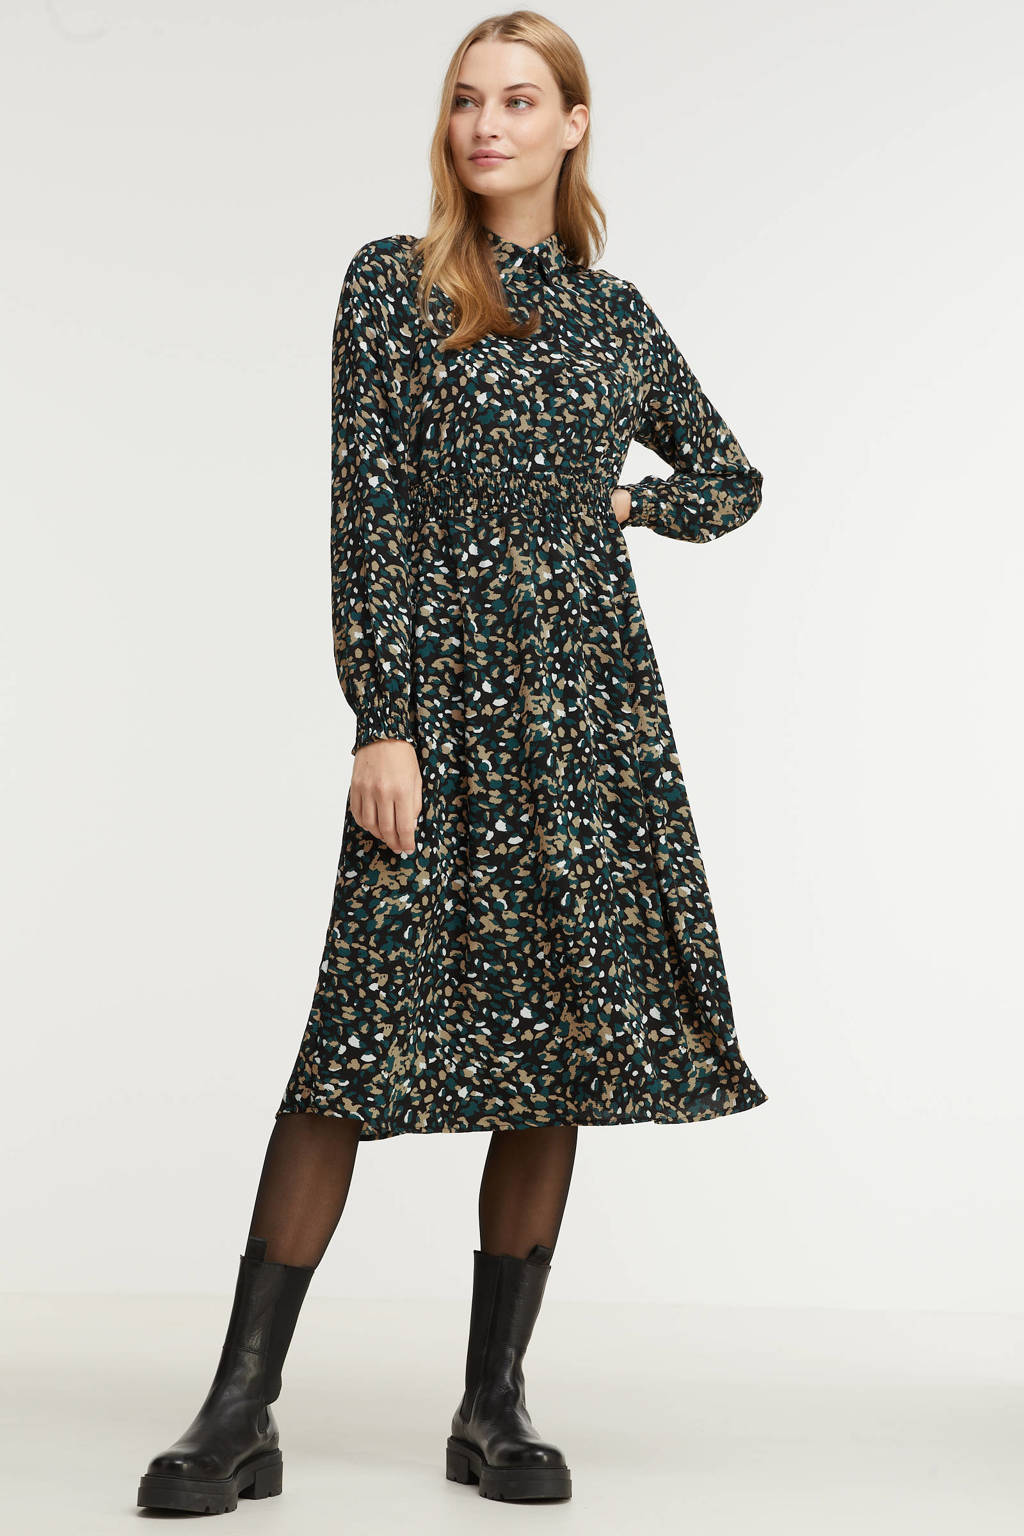 VERO MODA jurk VMSAGA van gerecycled polyester zwart/groen, Zwart/groen